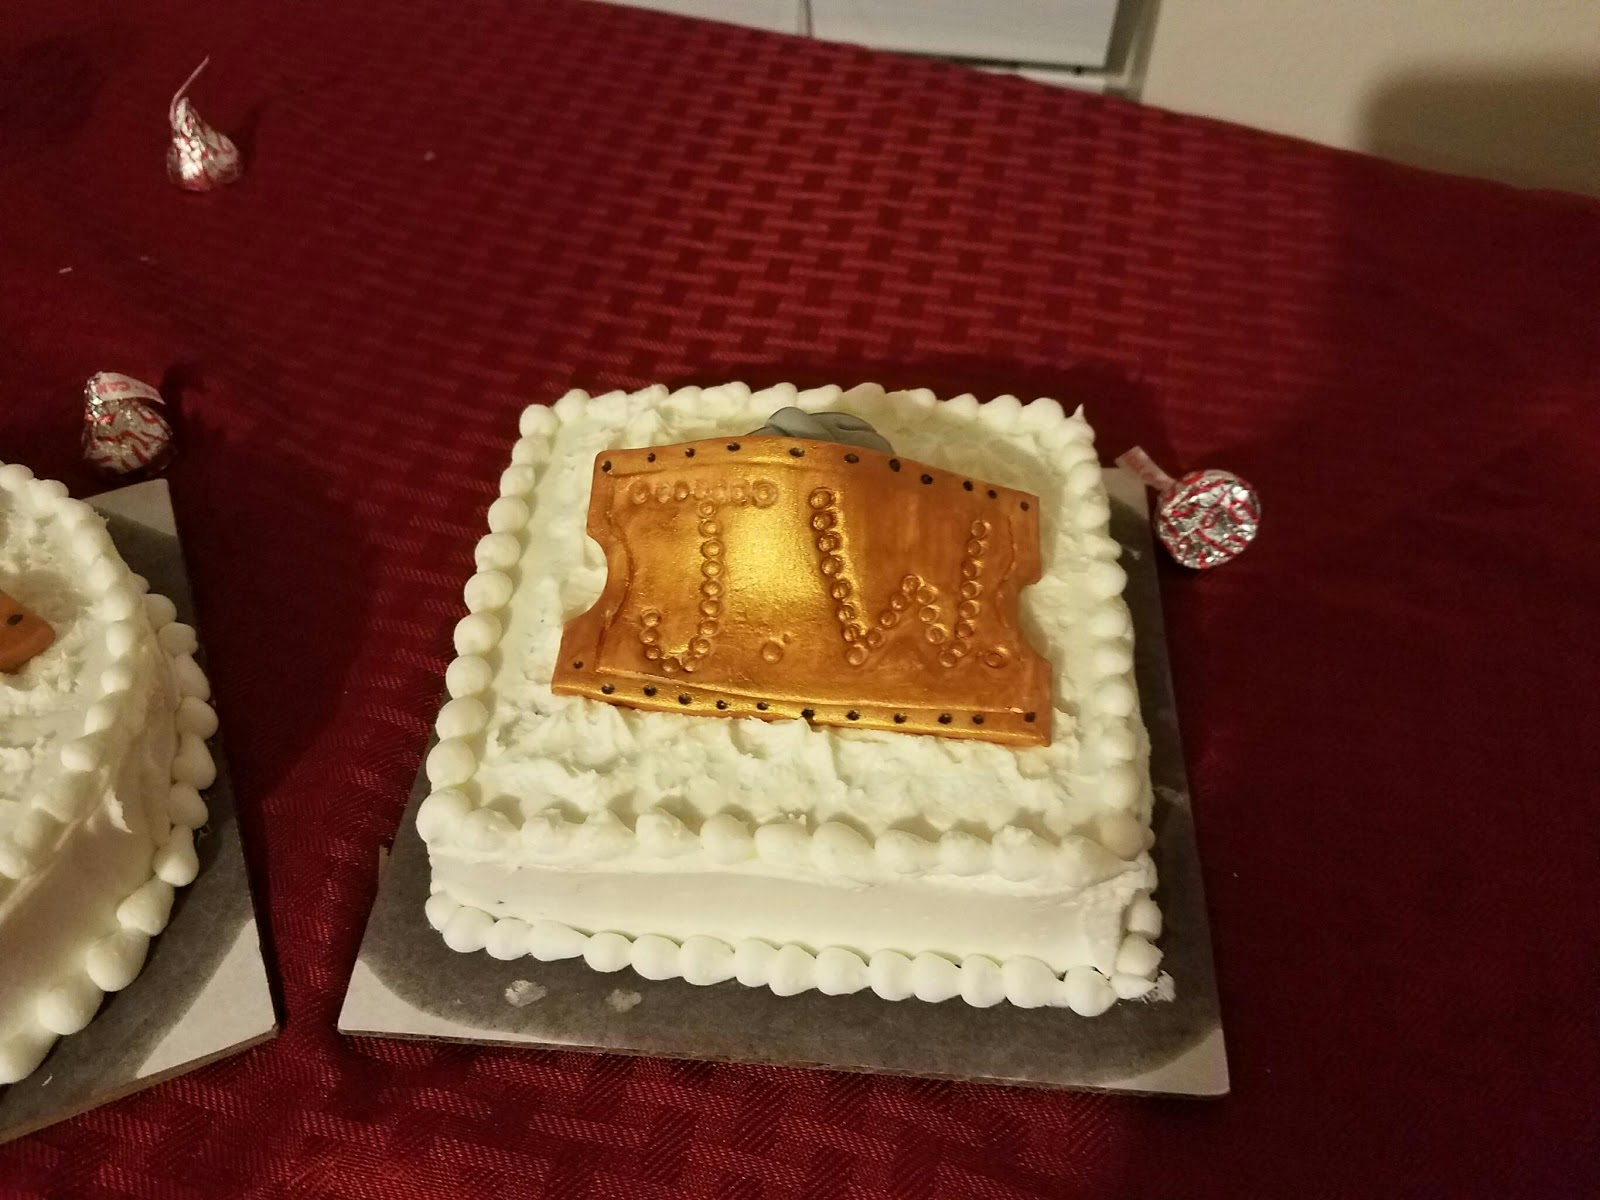 Admirable Cakes By Meg 2 Polar Express 1St Birthday Cake Funny Birthday Cards Online Elaedamsfinfo